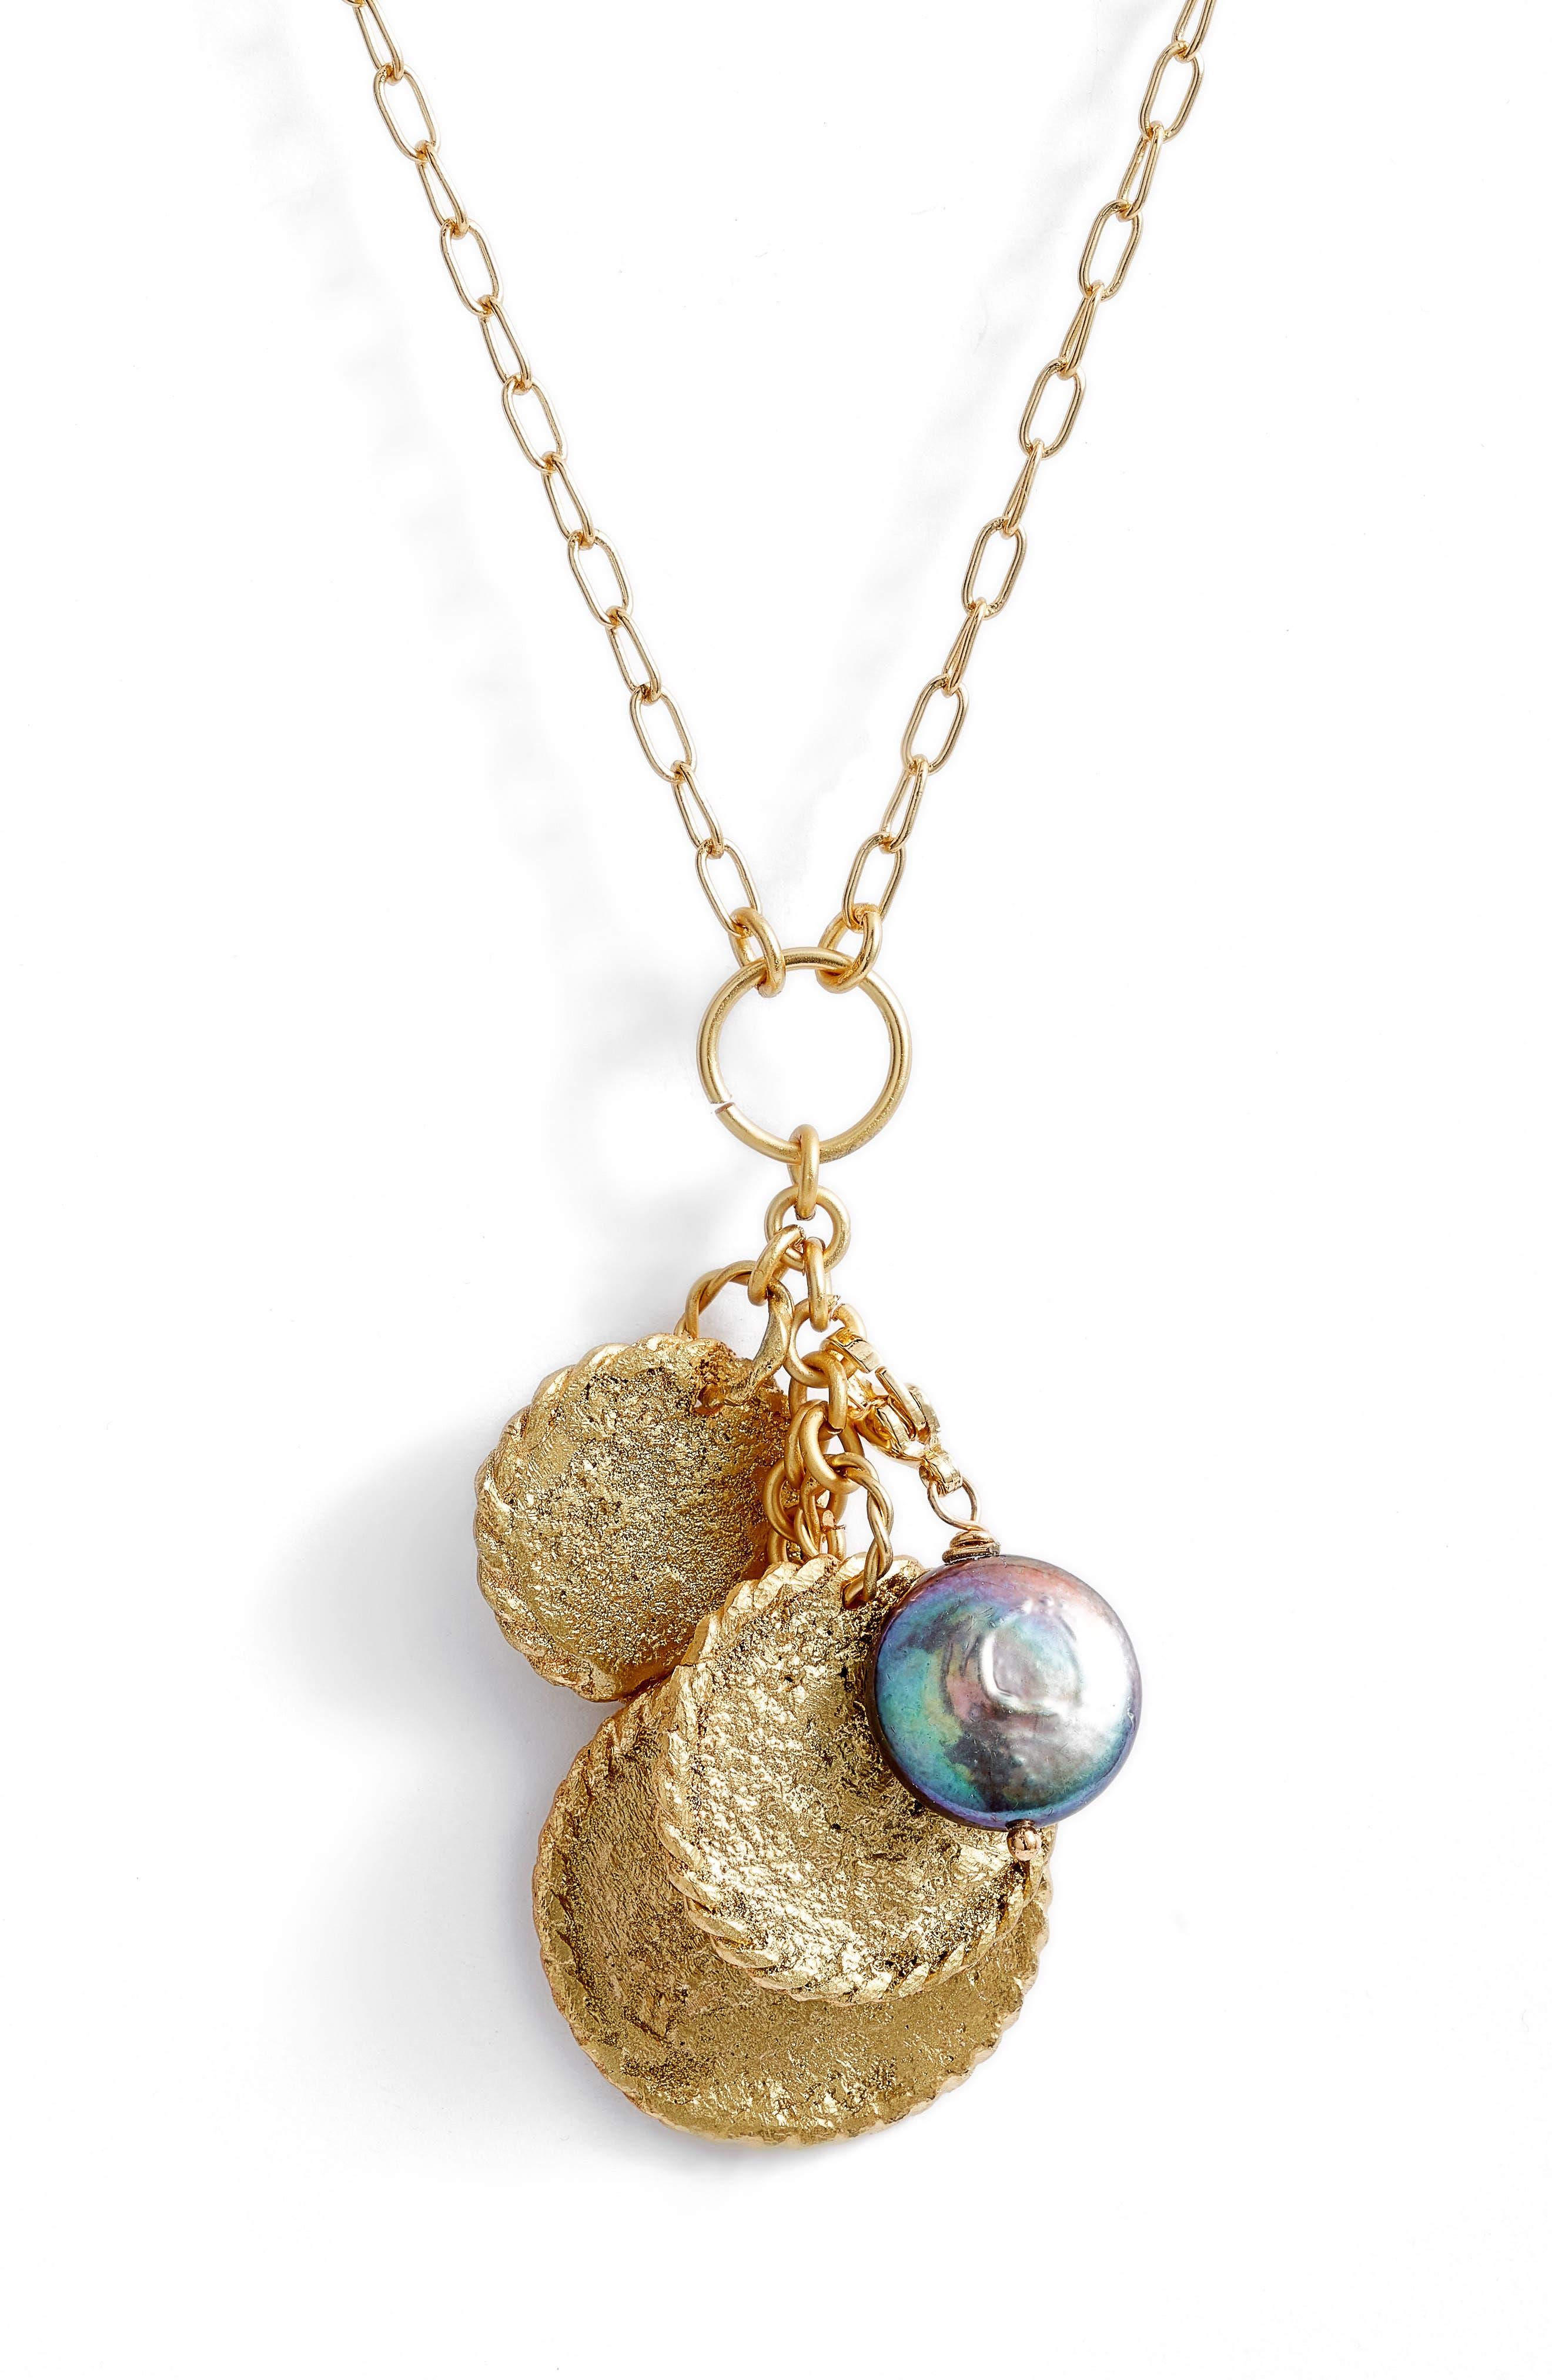 Caribe Tres Monedas Freshwater Pearl Pendant Necklace